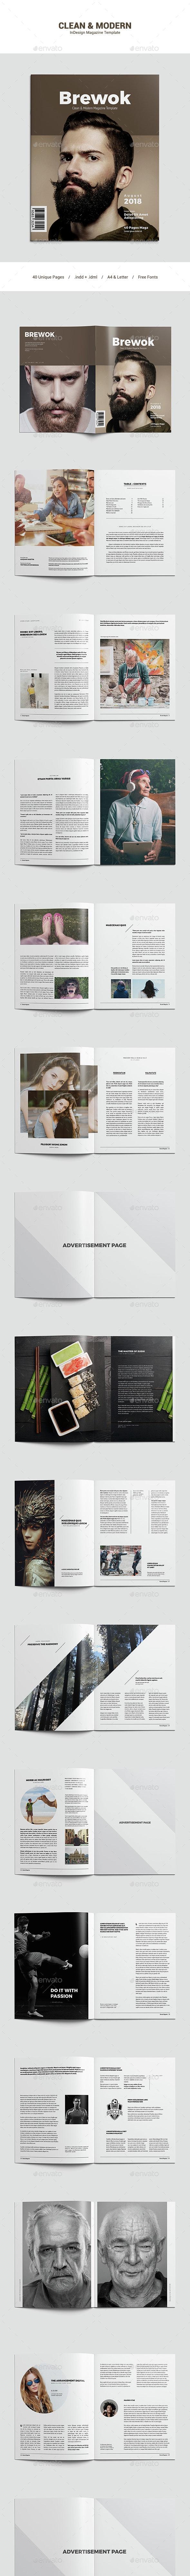 Clean & Modern Magazine Template - Magazines Print Templates